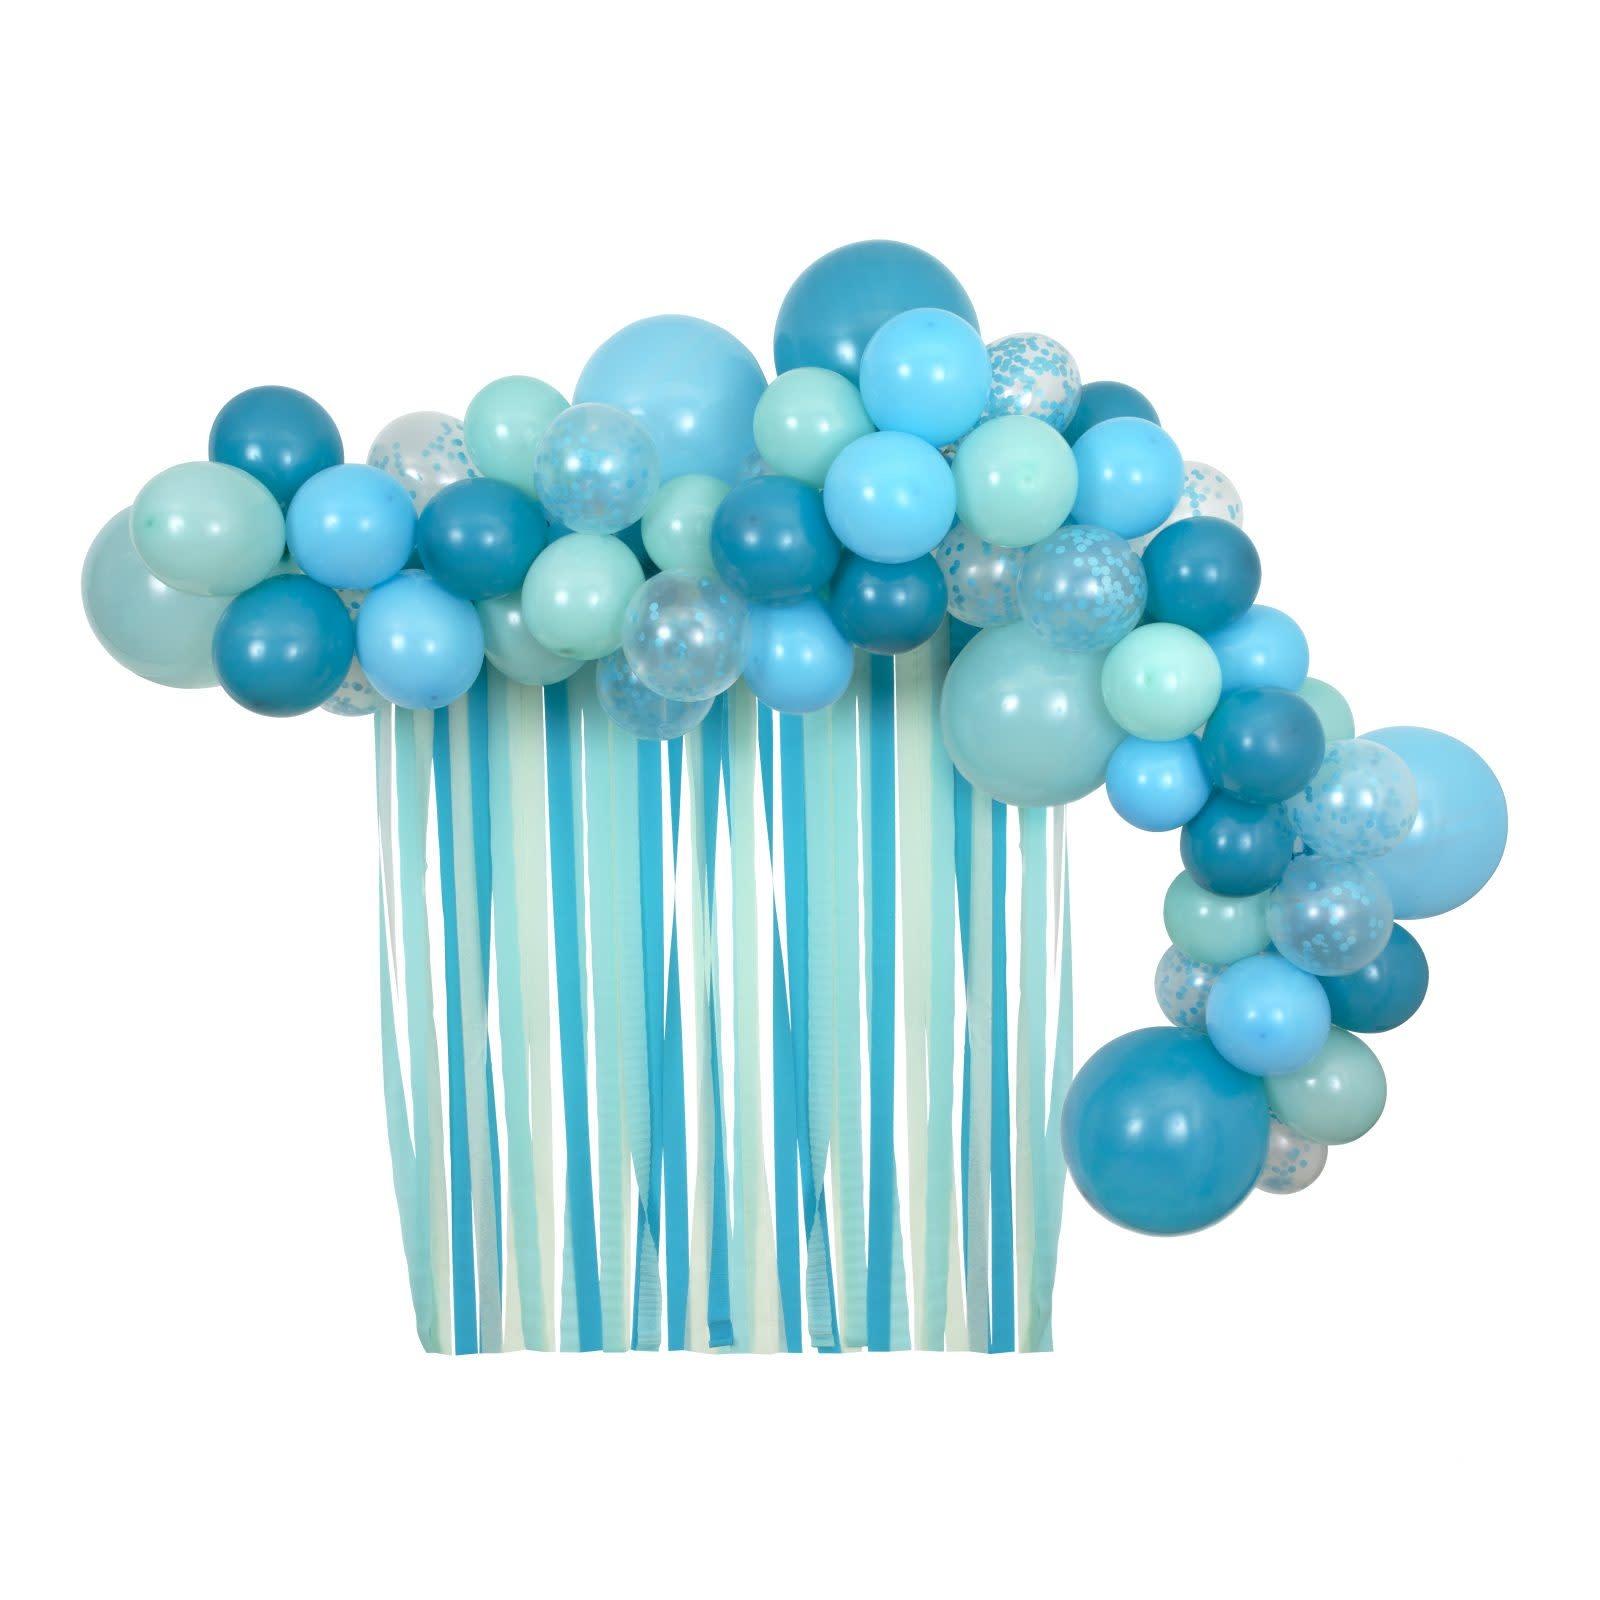 MERIMERI Blue balloon & streamers kit